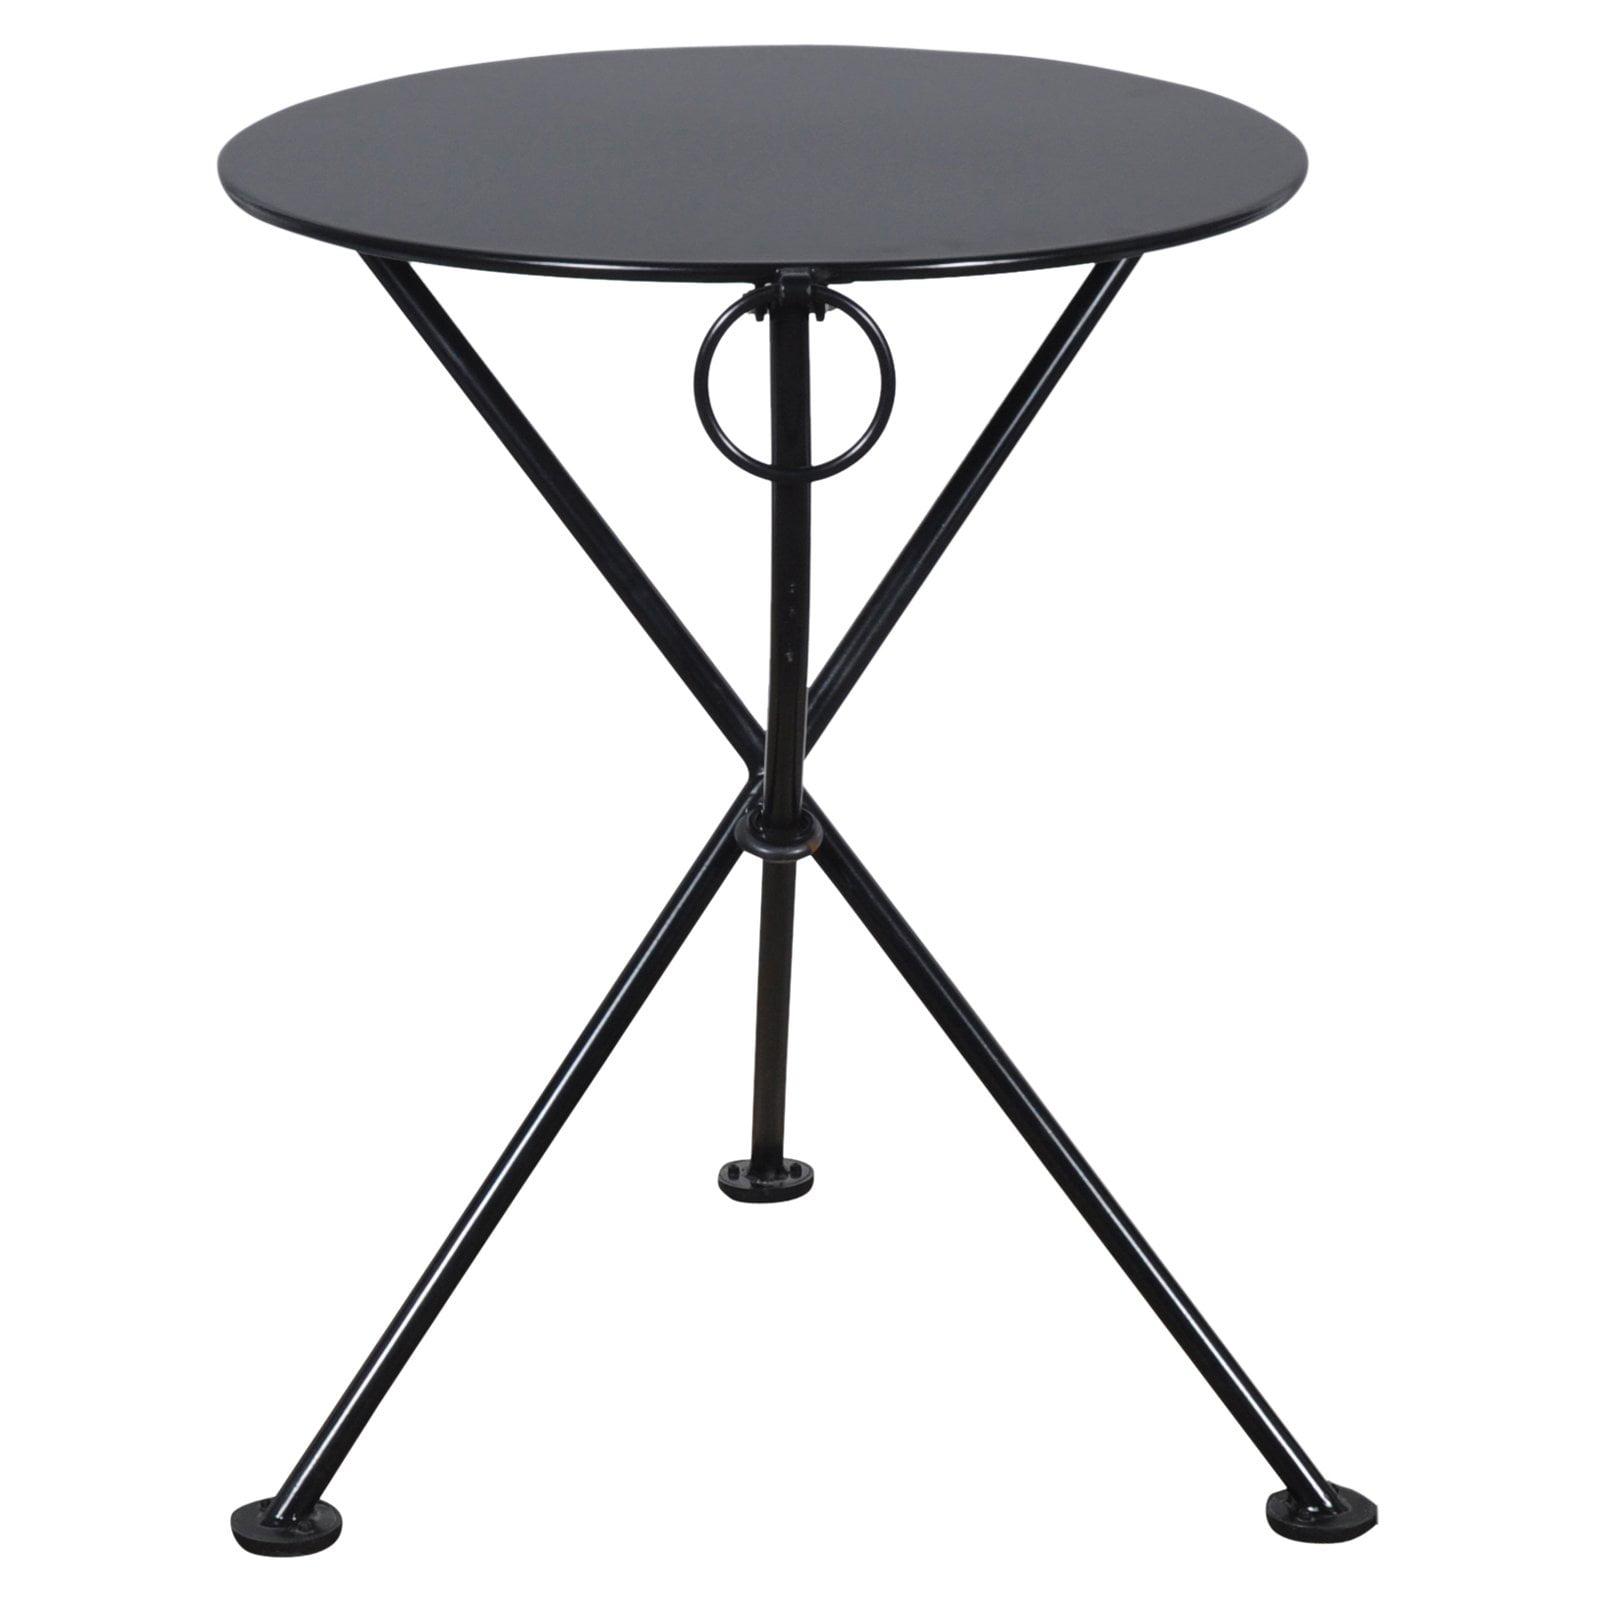 Furniture Designhouse French Veranda European Cafe 24 in. Round Folding Patio Bistro Table